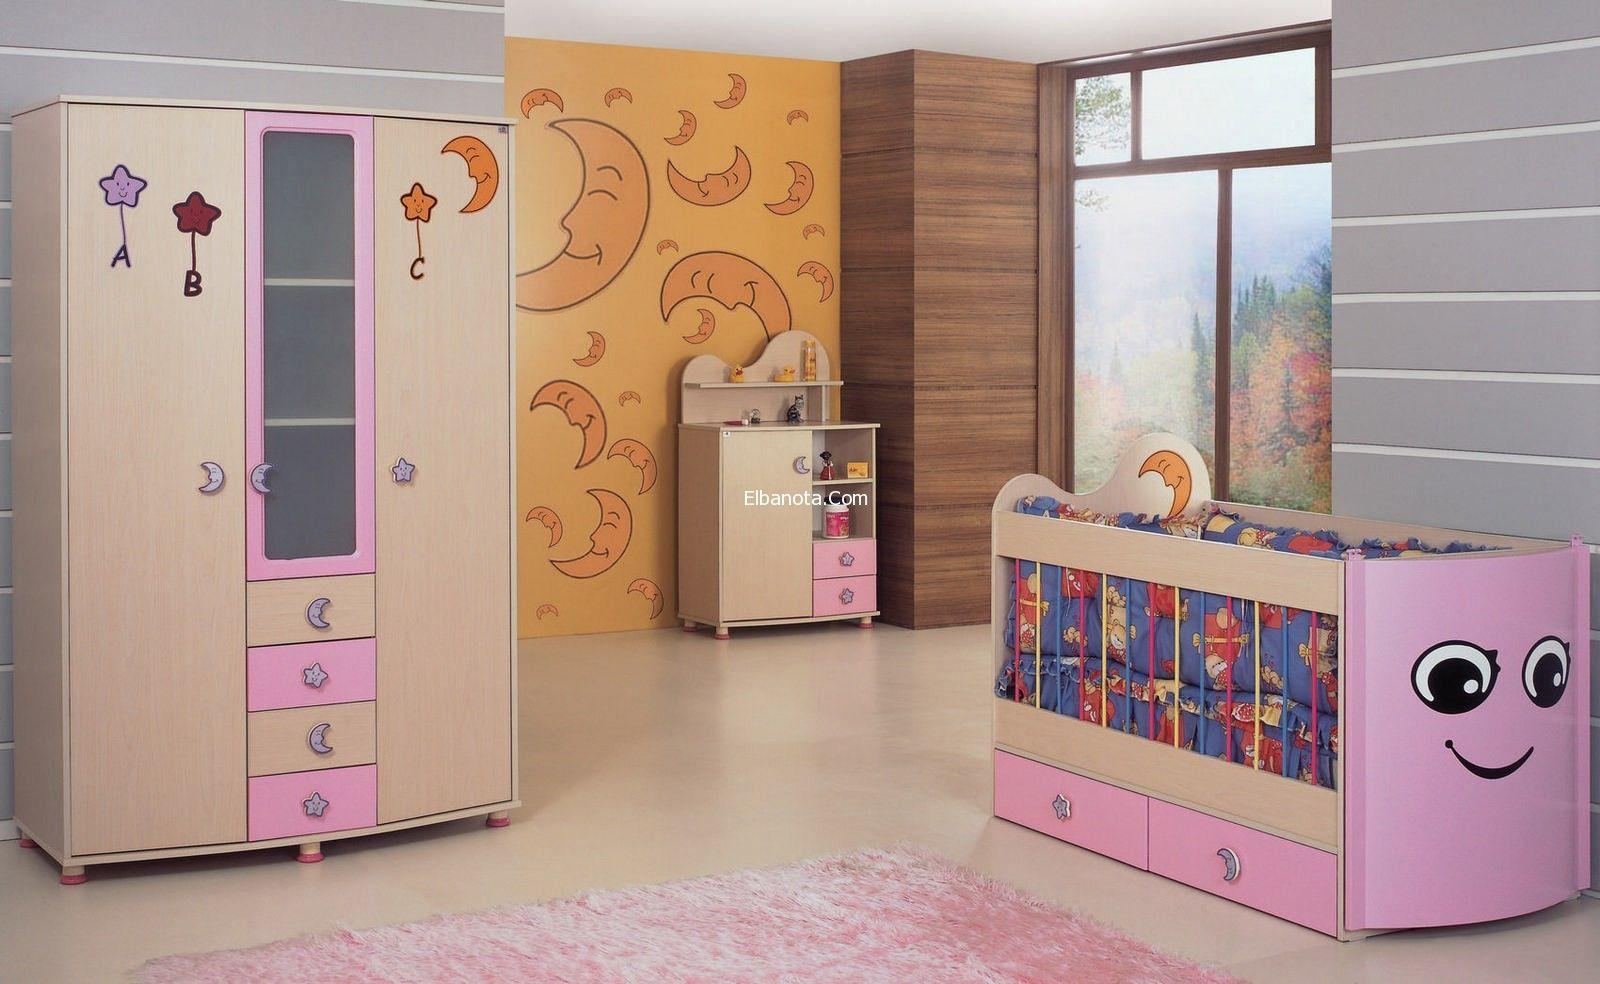 غرف نوم للاطفال بالصور ديكورات غرف نوم للاطفال بنات اثاث غرف نوم للاطفال الرضع احلى ديكورات بنوته كافيه Toddler Bed Bed Home Decor